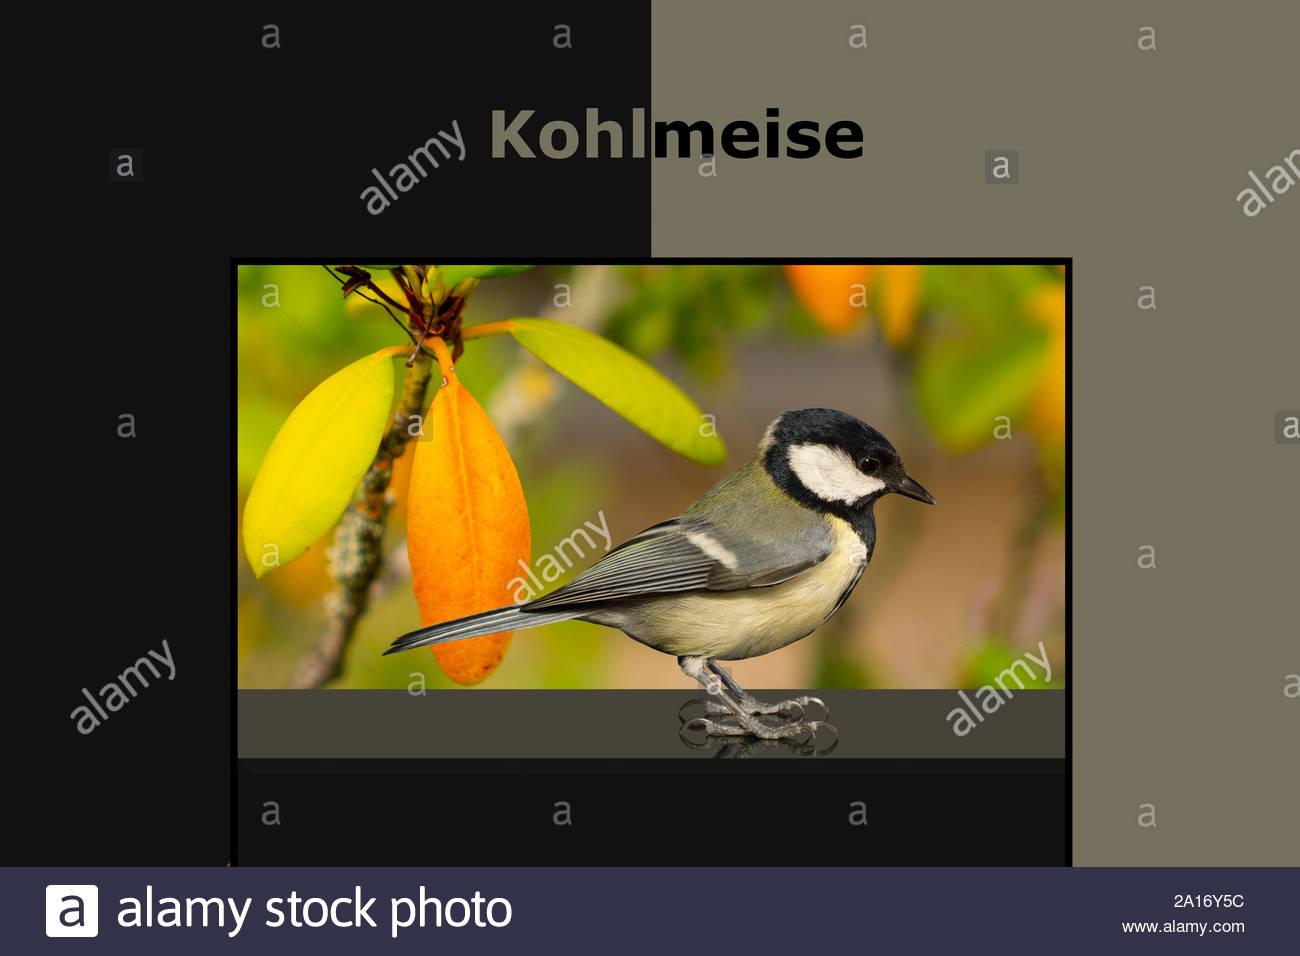 Vogel-Portrait-Kohlmeise. Hintergrund Nr.16 Rahmen Nr.3 Stock Photo